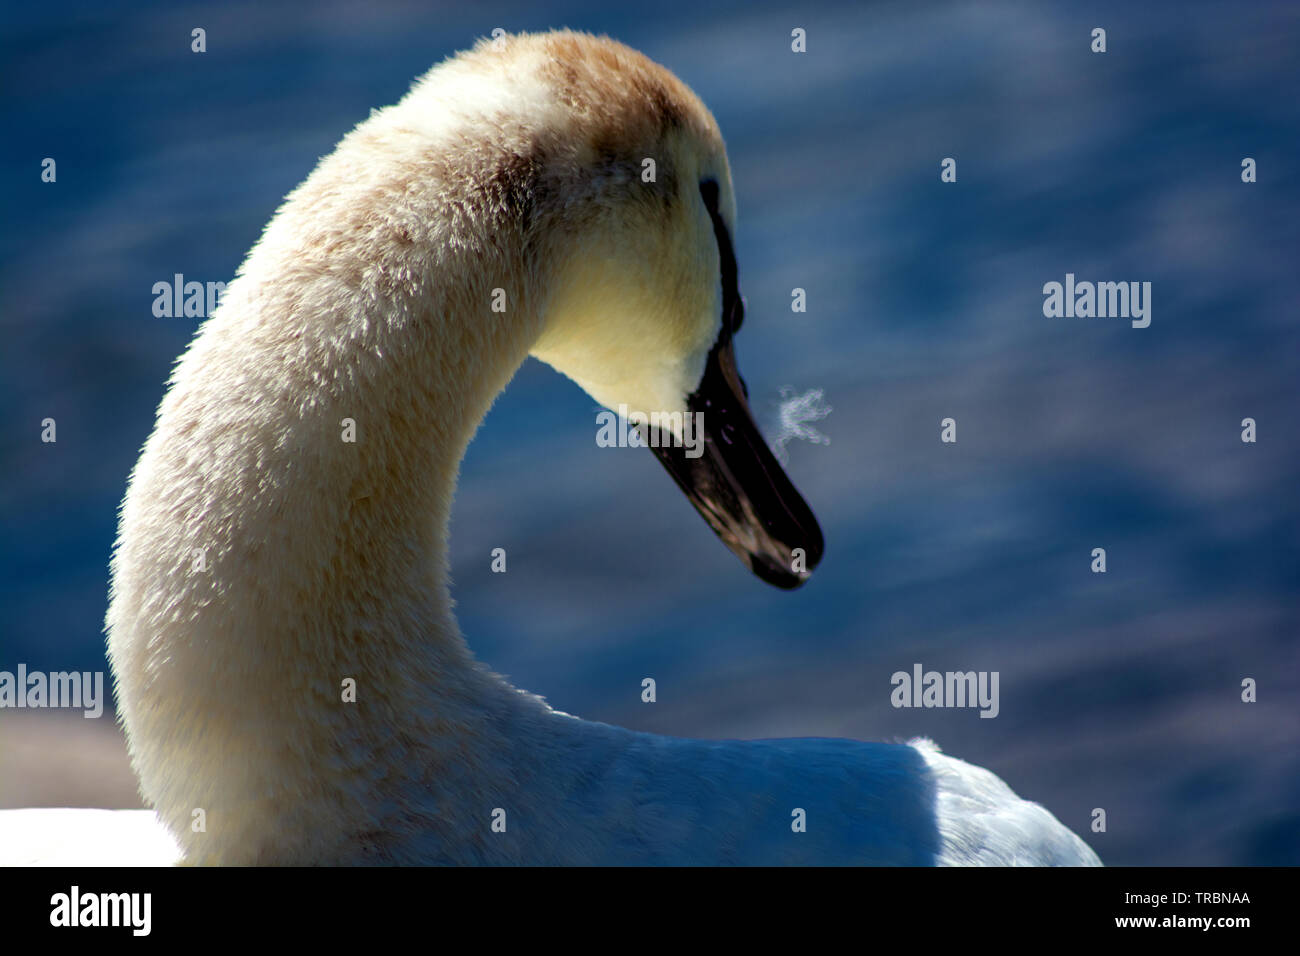 Concept wildlife : The Queen of Water - Stock Image